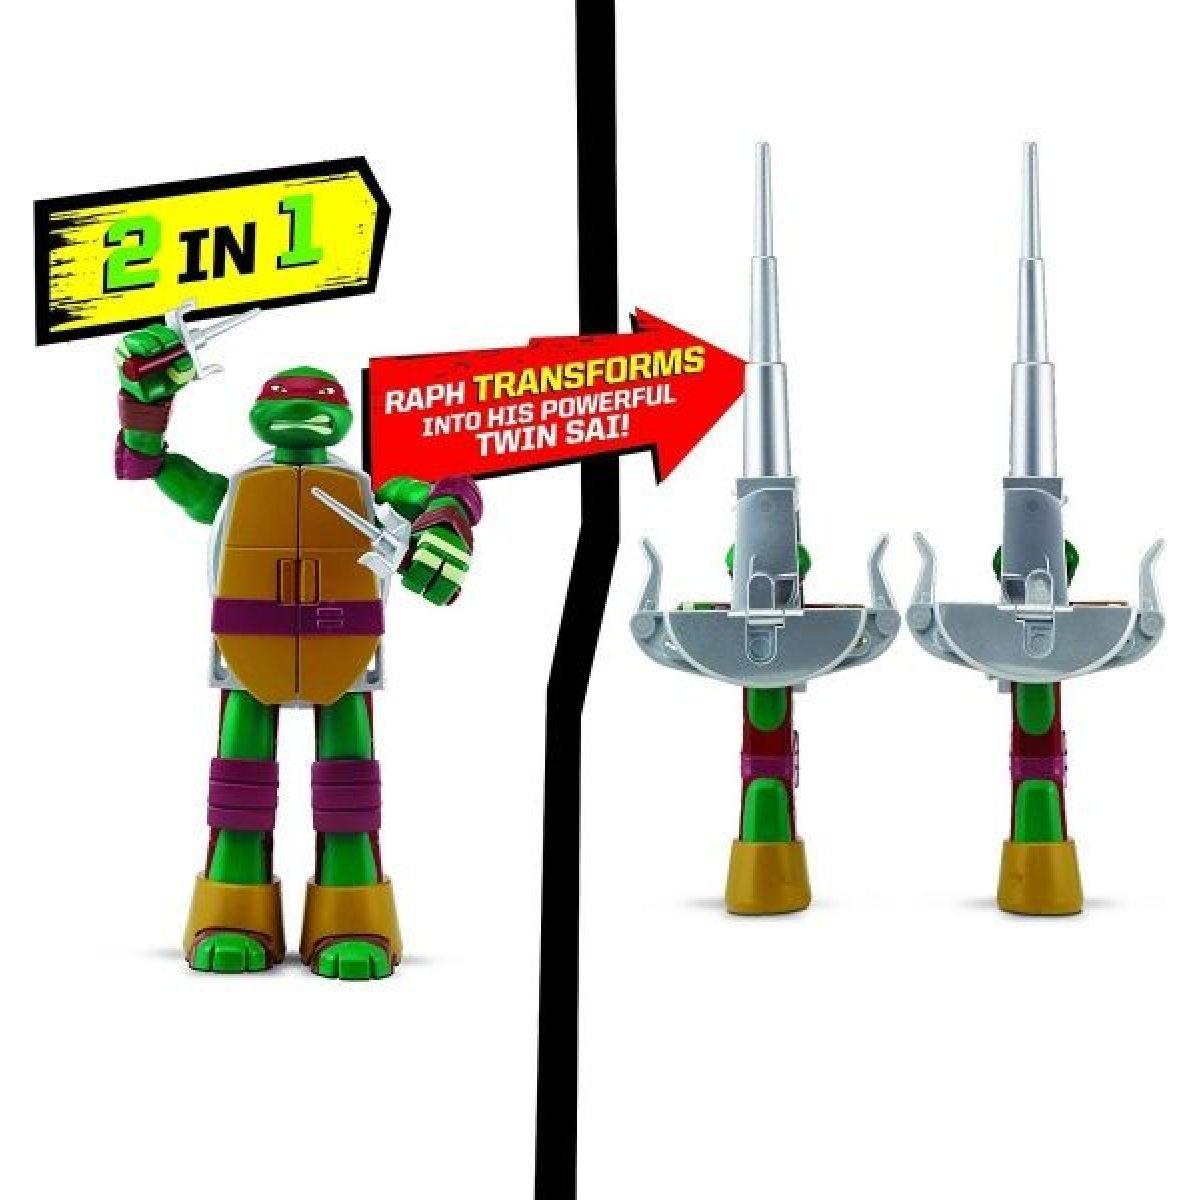 Playmates TMNT Želvy Ninja Transform to weapon Raphael